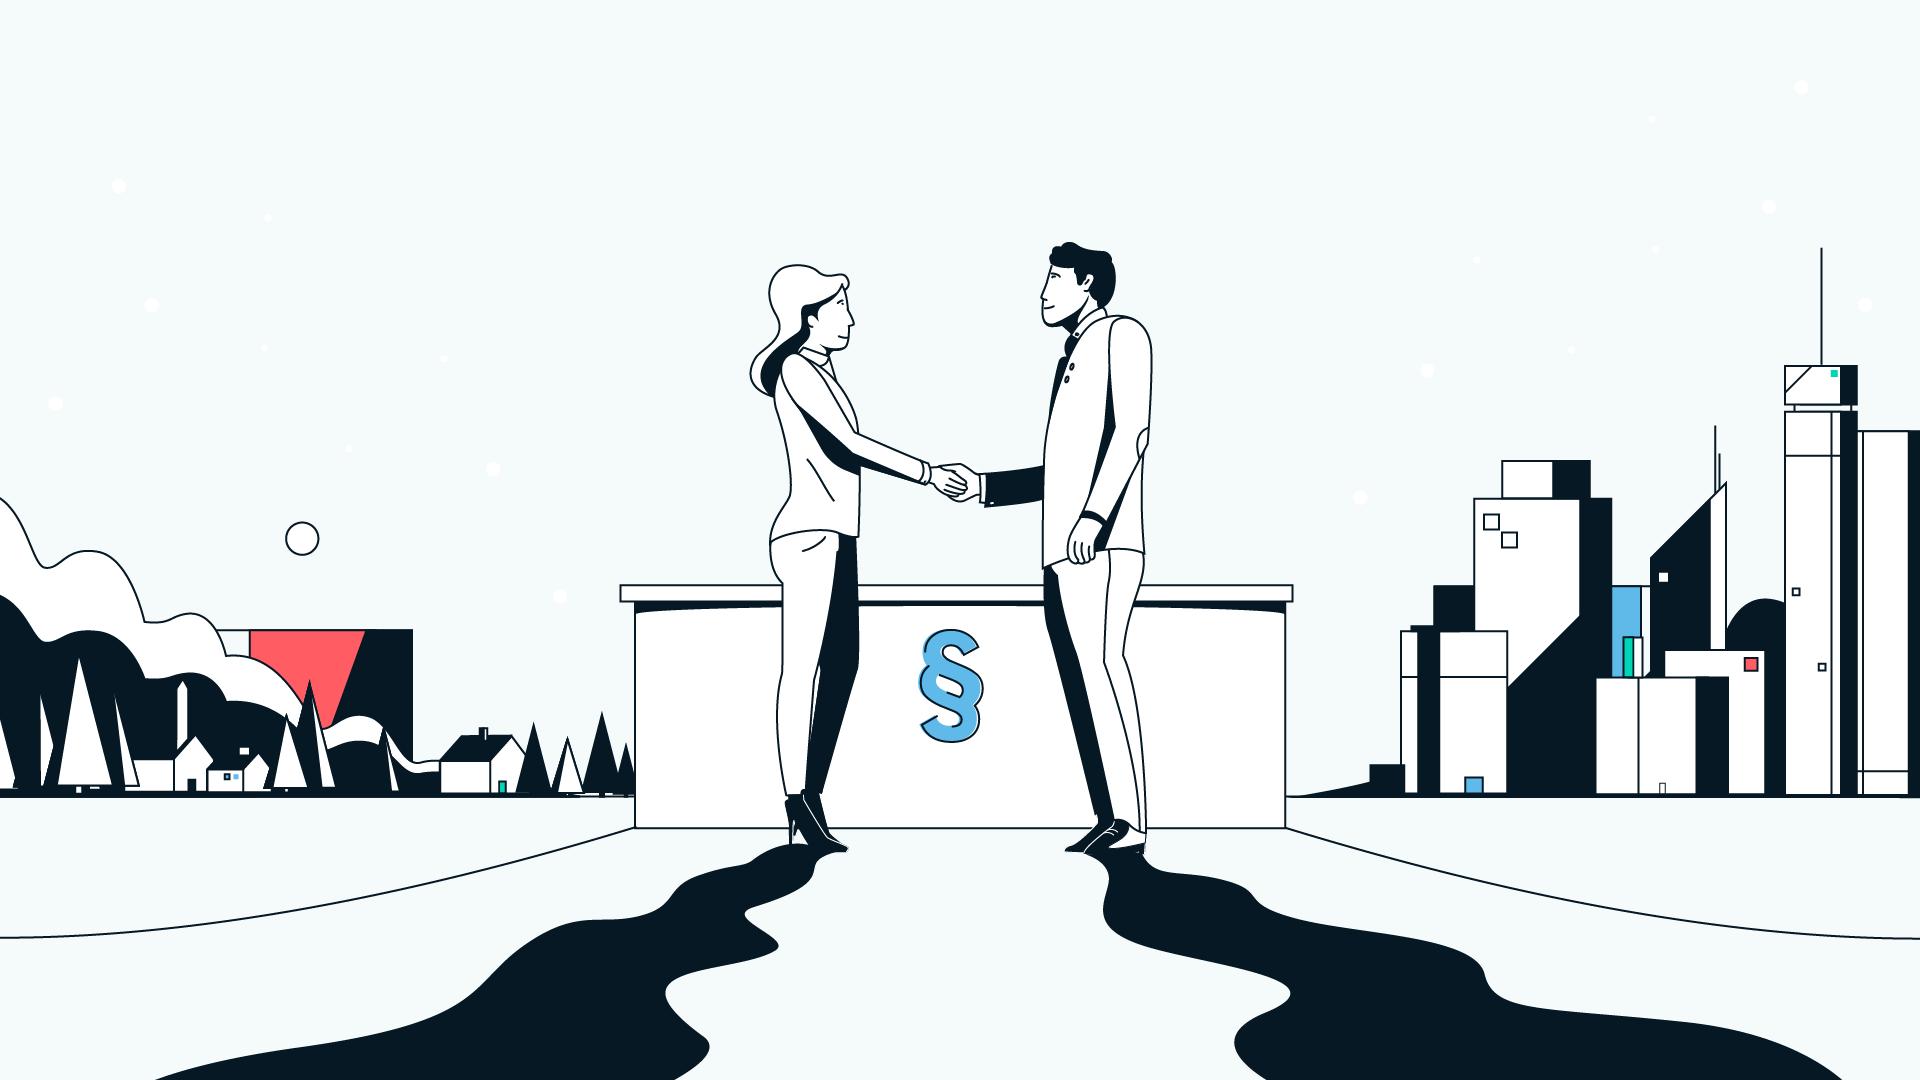 Styleframe Handshake